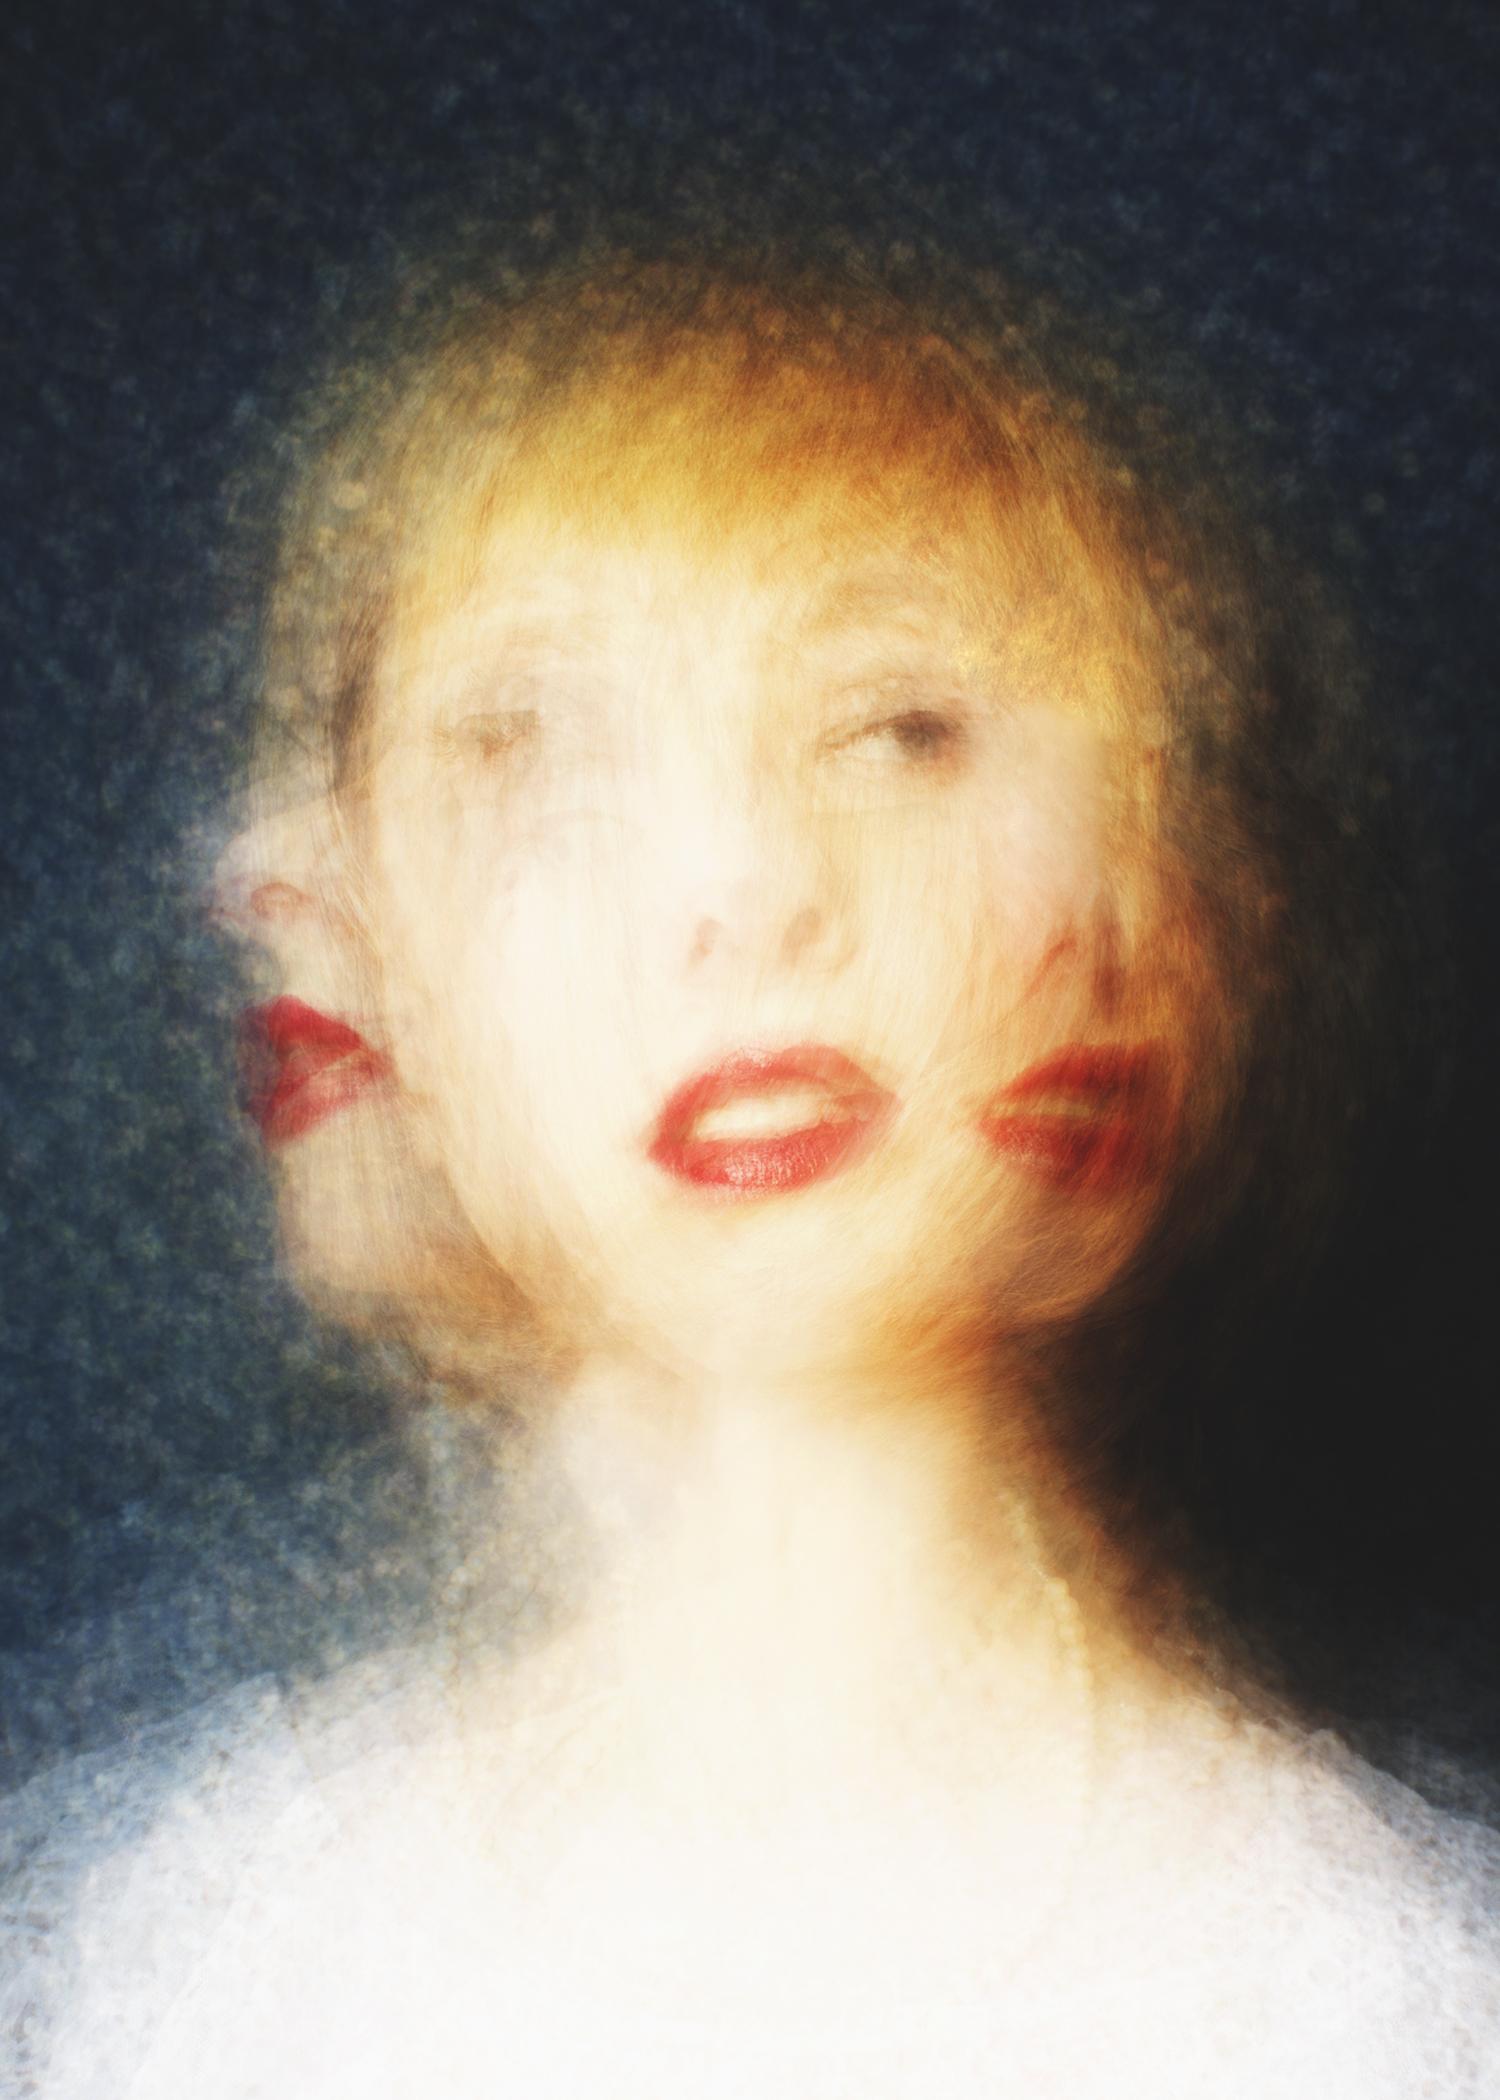 The work of University of North Texas senior photography major Megan Gellner – i